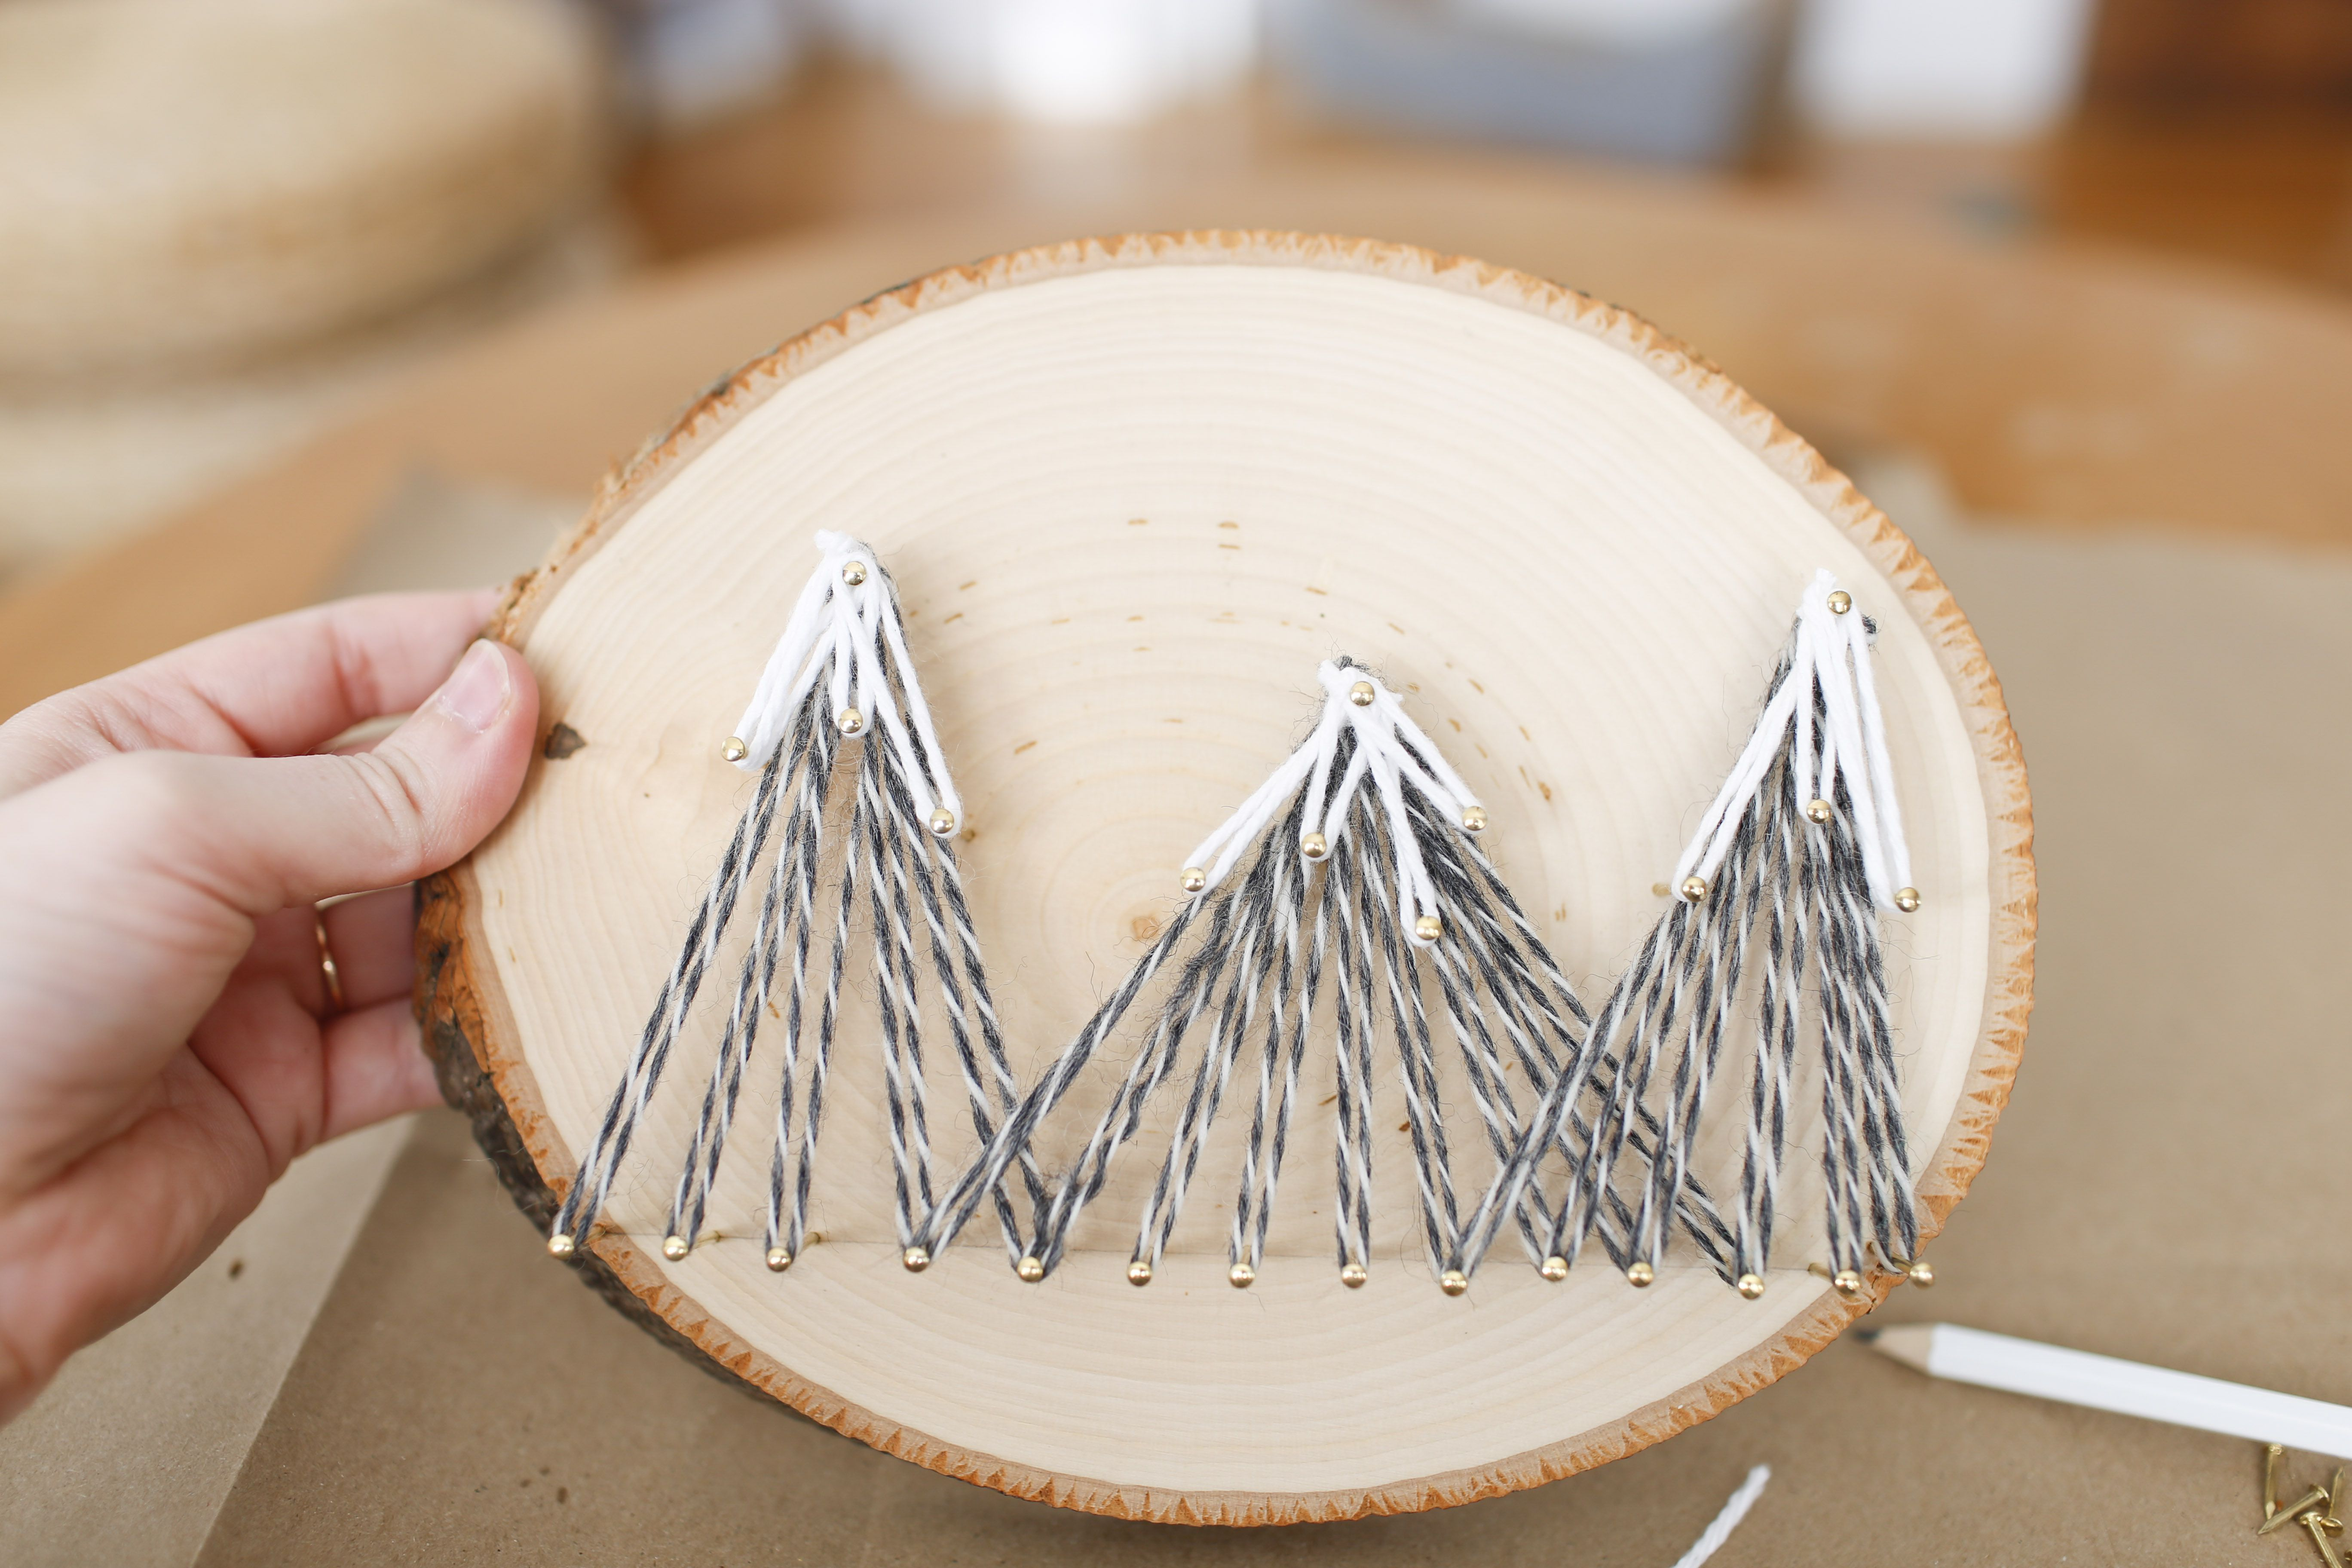 Hand holding mountain string art